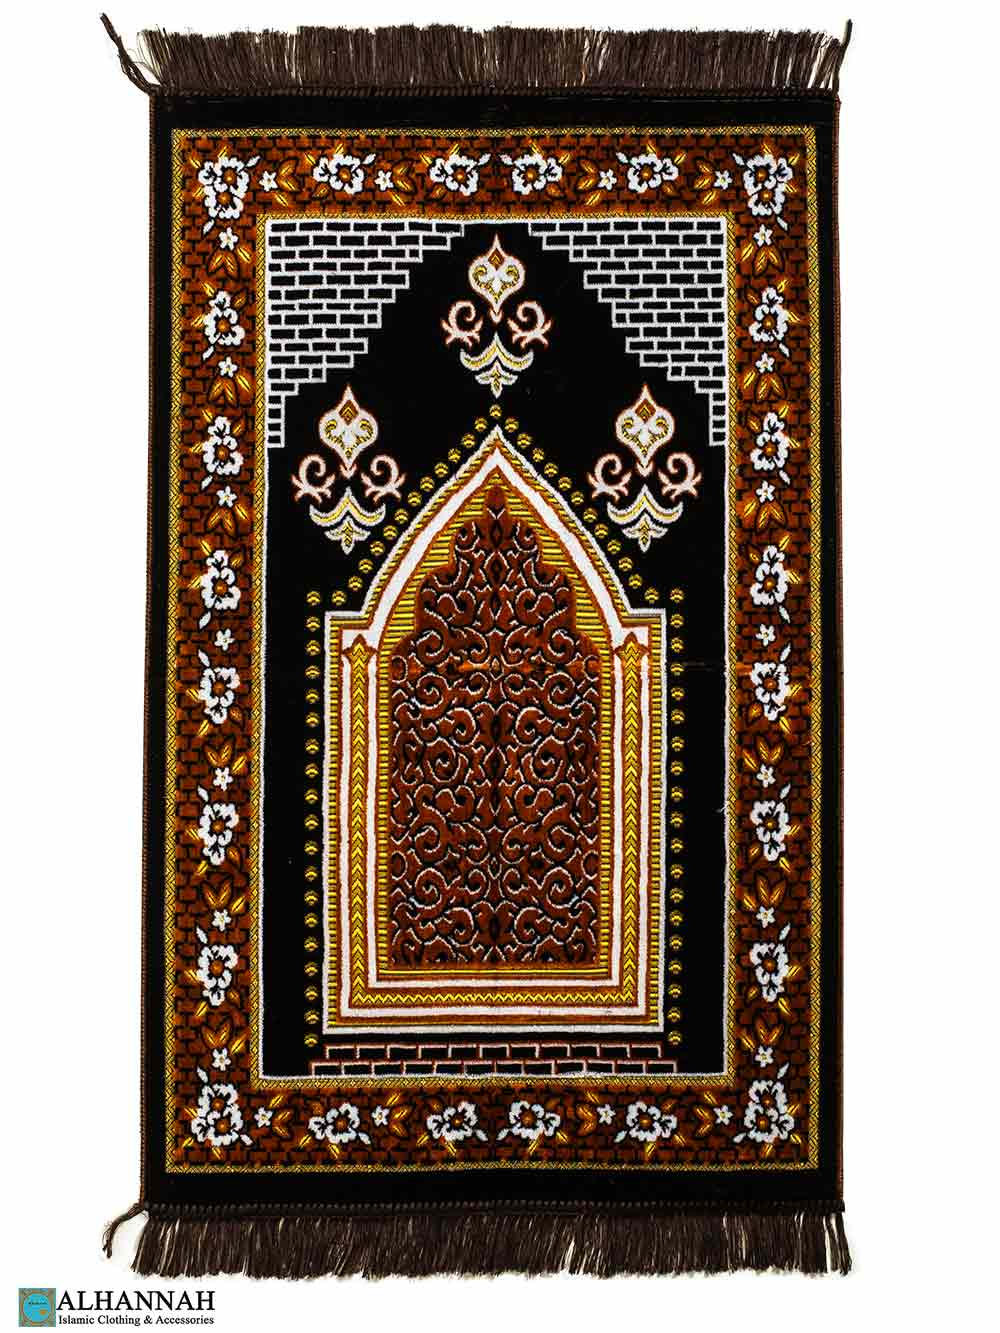 Turkish Prayer Rug Foliage Boarder - Brown